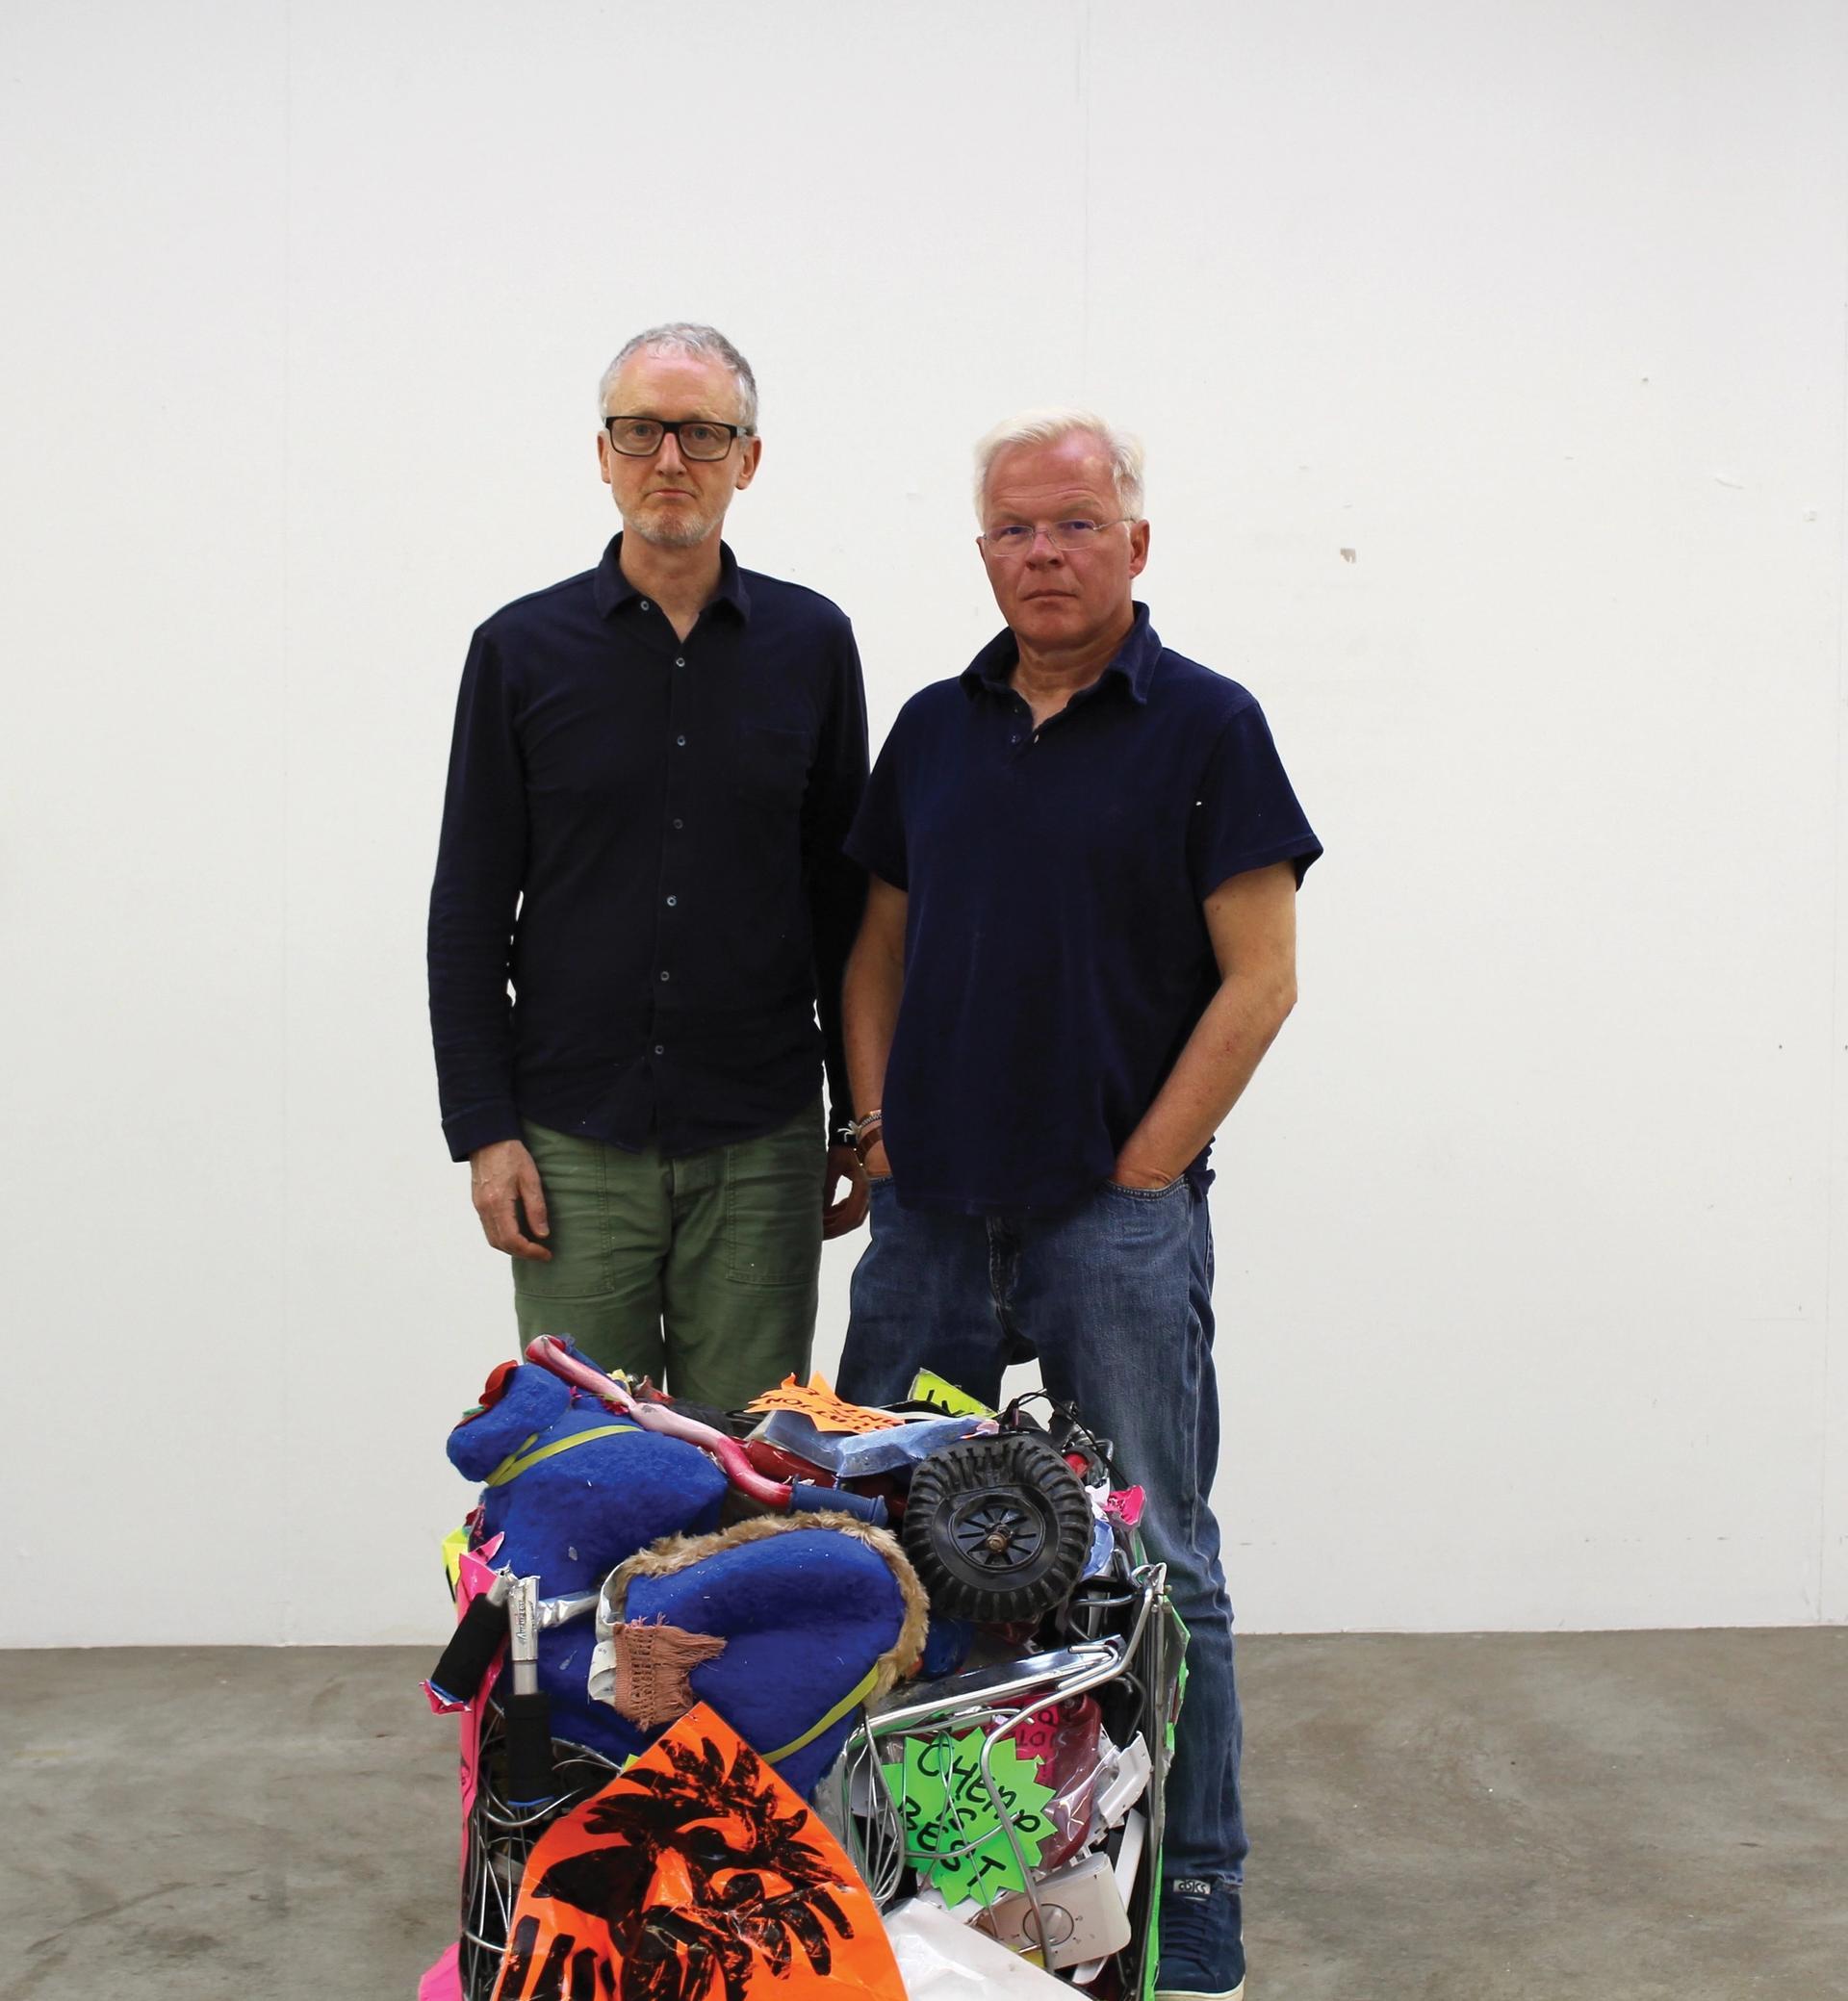 Michael Landy (left) was signed by Karsten Schubert 30 years ago